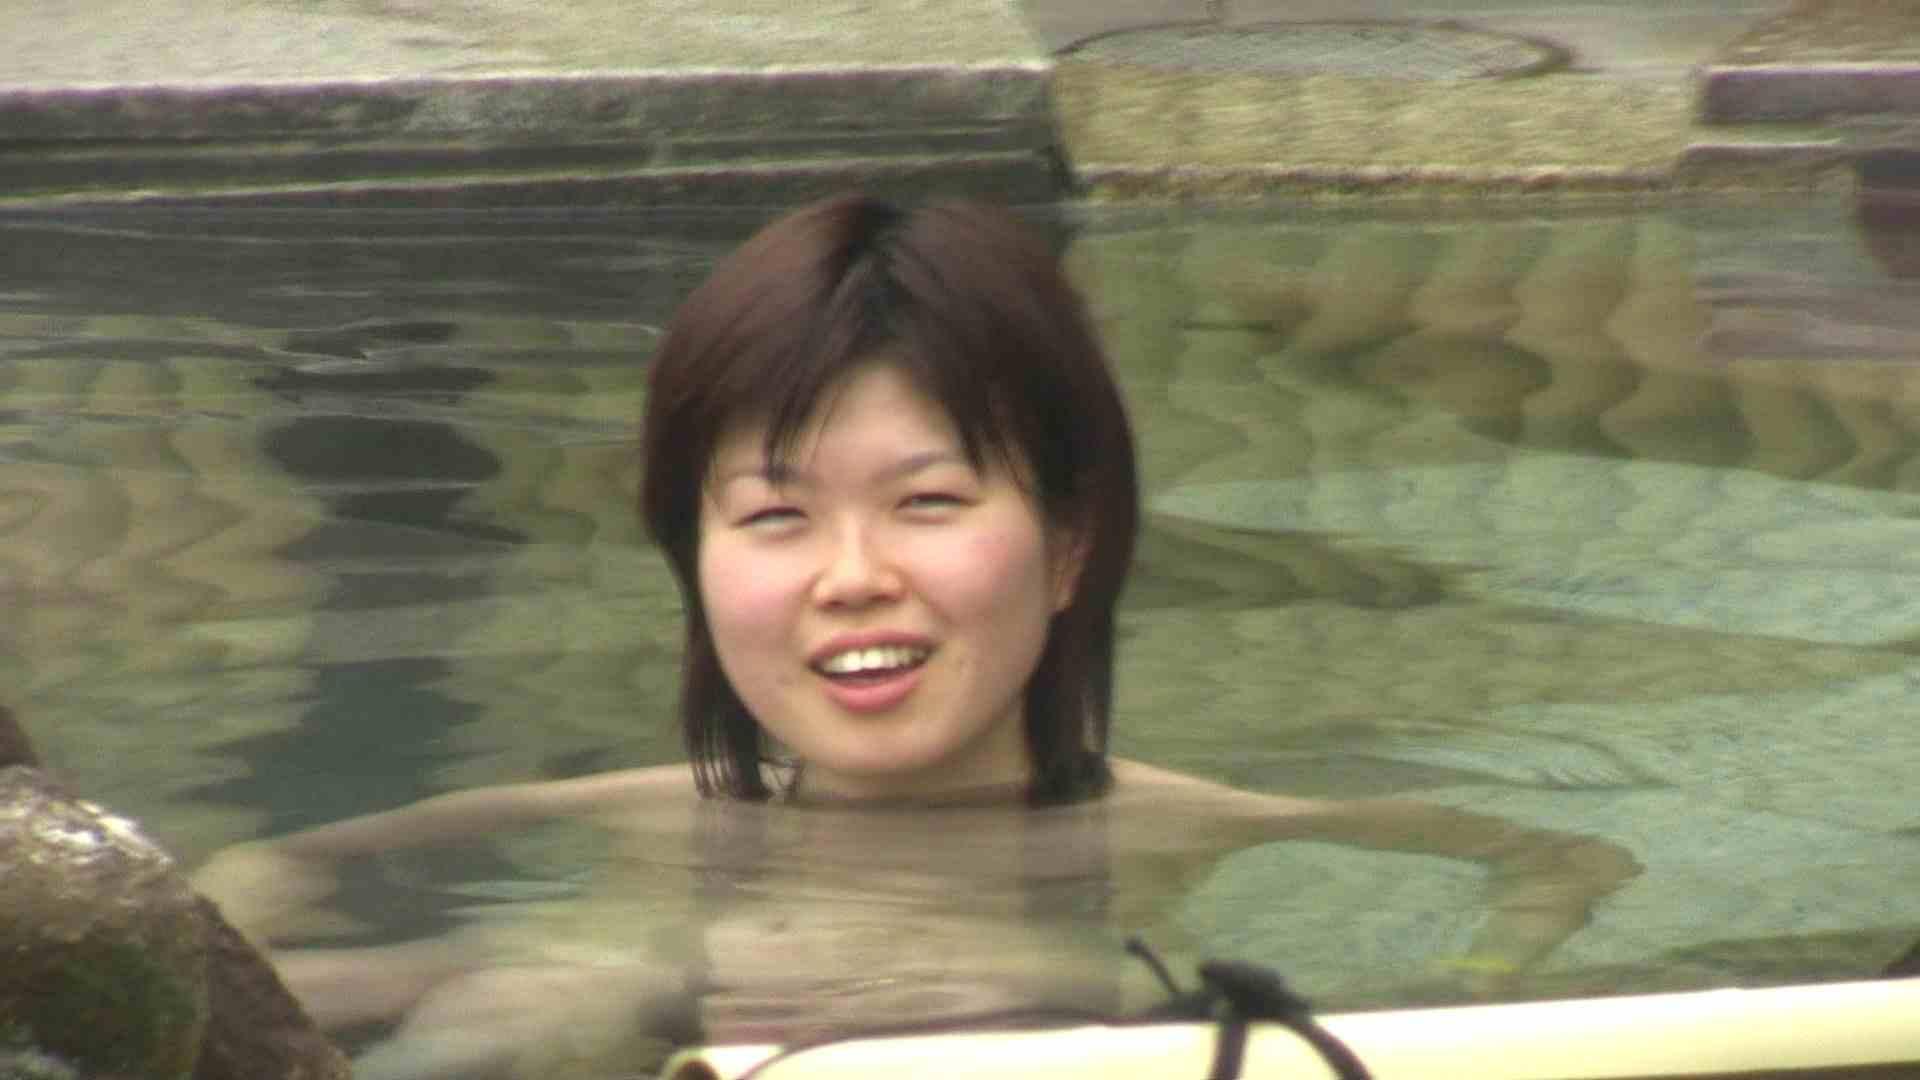 Aquaな露天風呂Vol.675 露天風呂編  91PIX 24